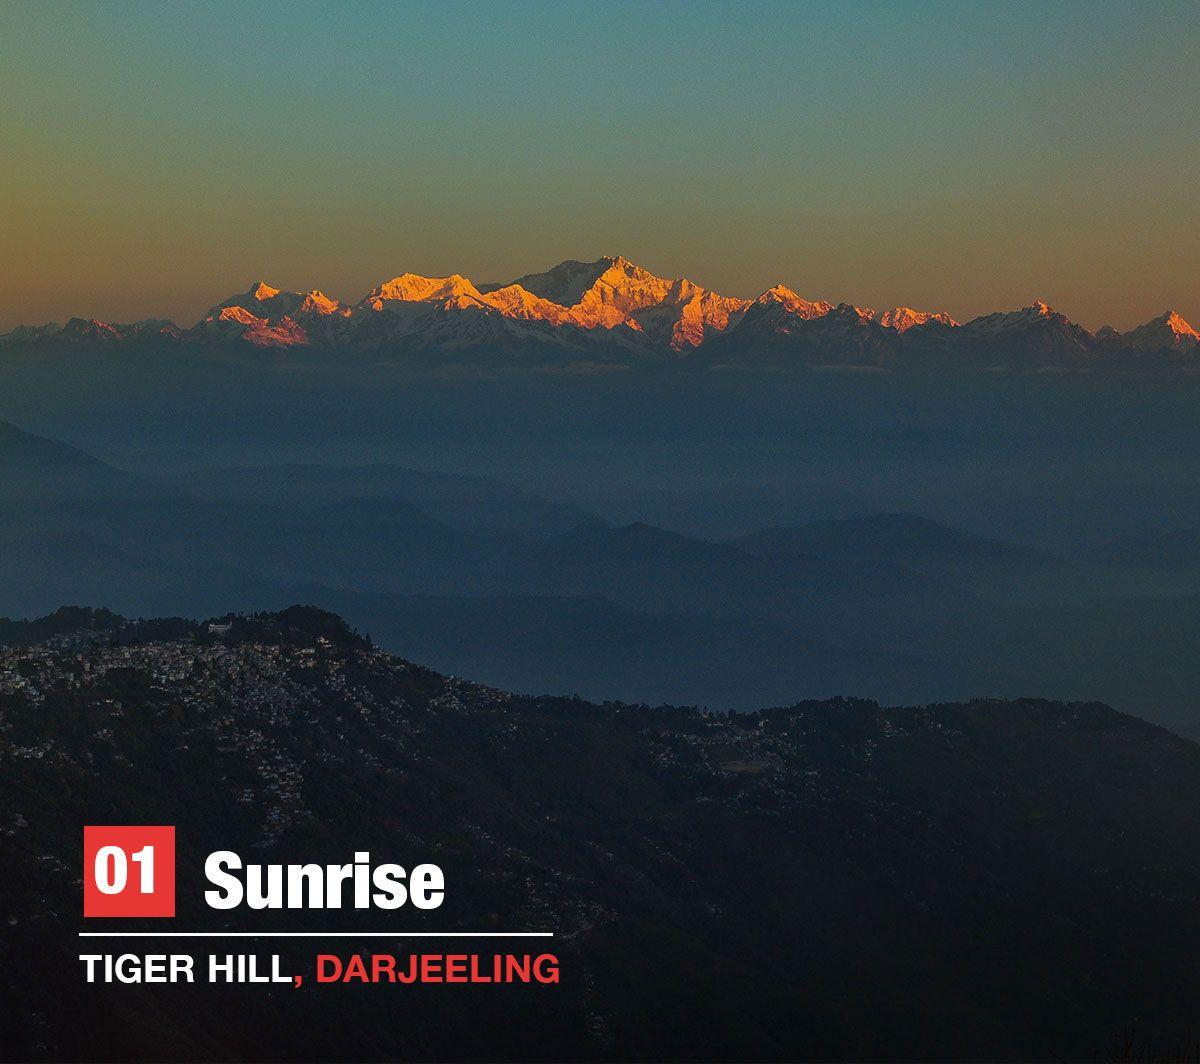 sun rise tiger hill Darjeeling